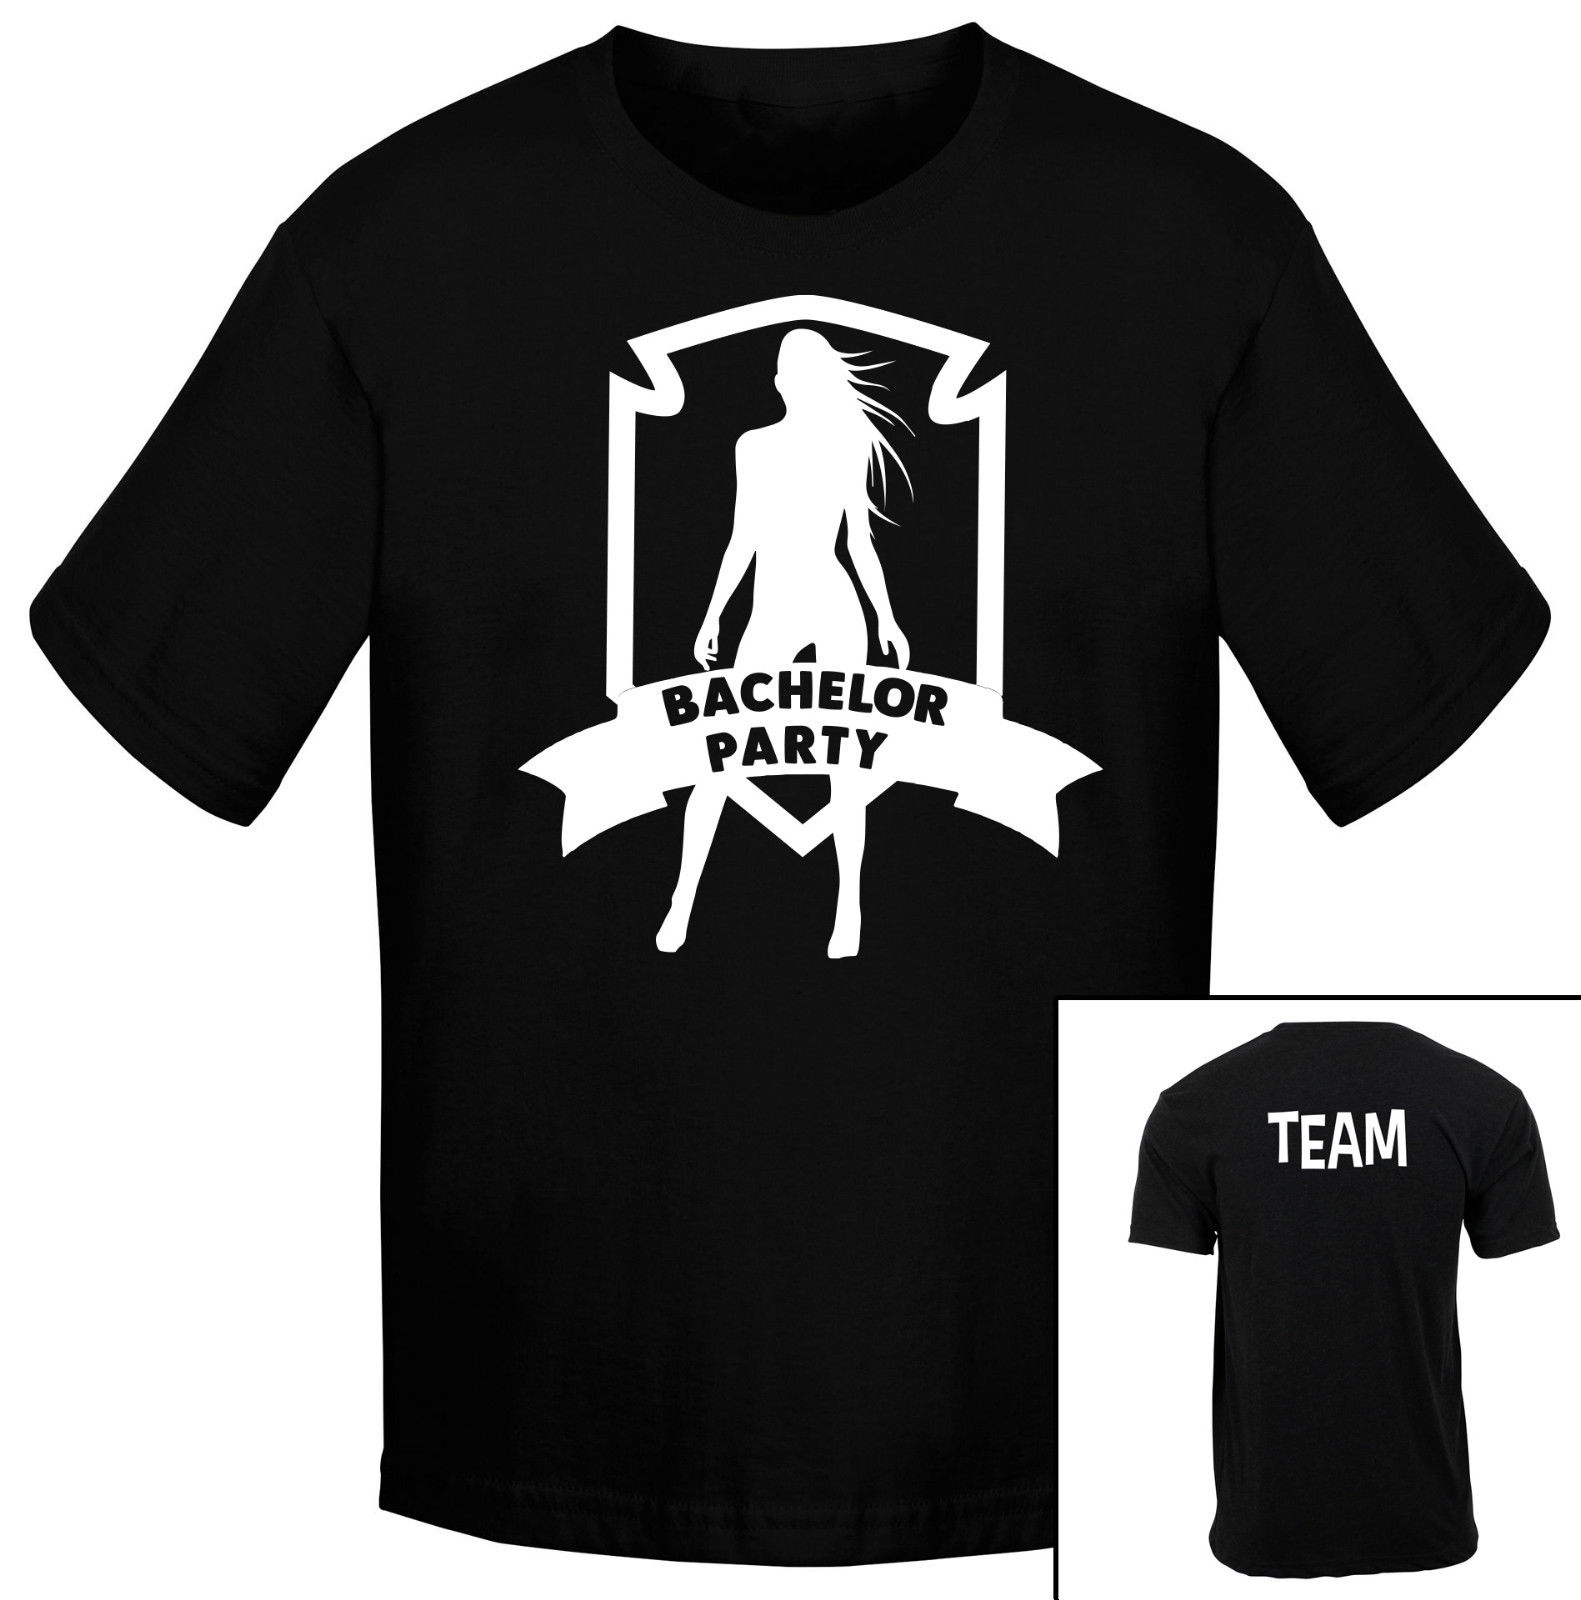 online store e103f a2cda US $11.99 40% OFF|T SHIRT BACHELOR PARTY TEAM GROOM WEDDING MAGLIA UOMO  SHIRT JERSEY MAN NERA Cartoon t shirt men Unisex New Fashion tshirt-in ...